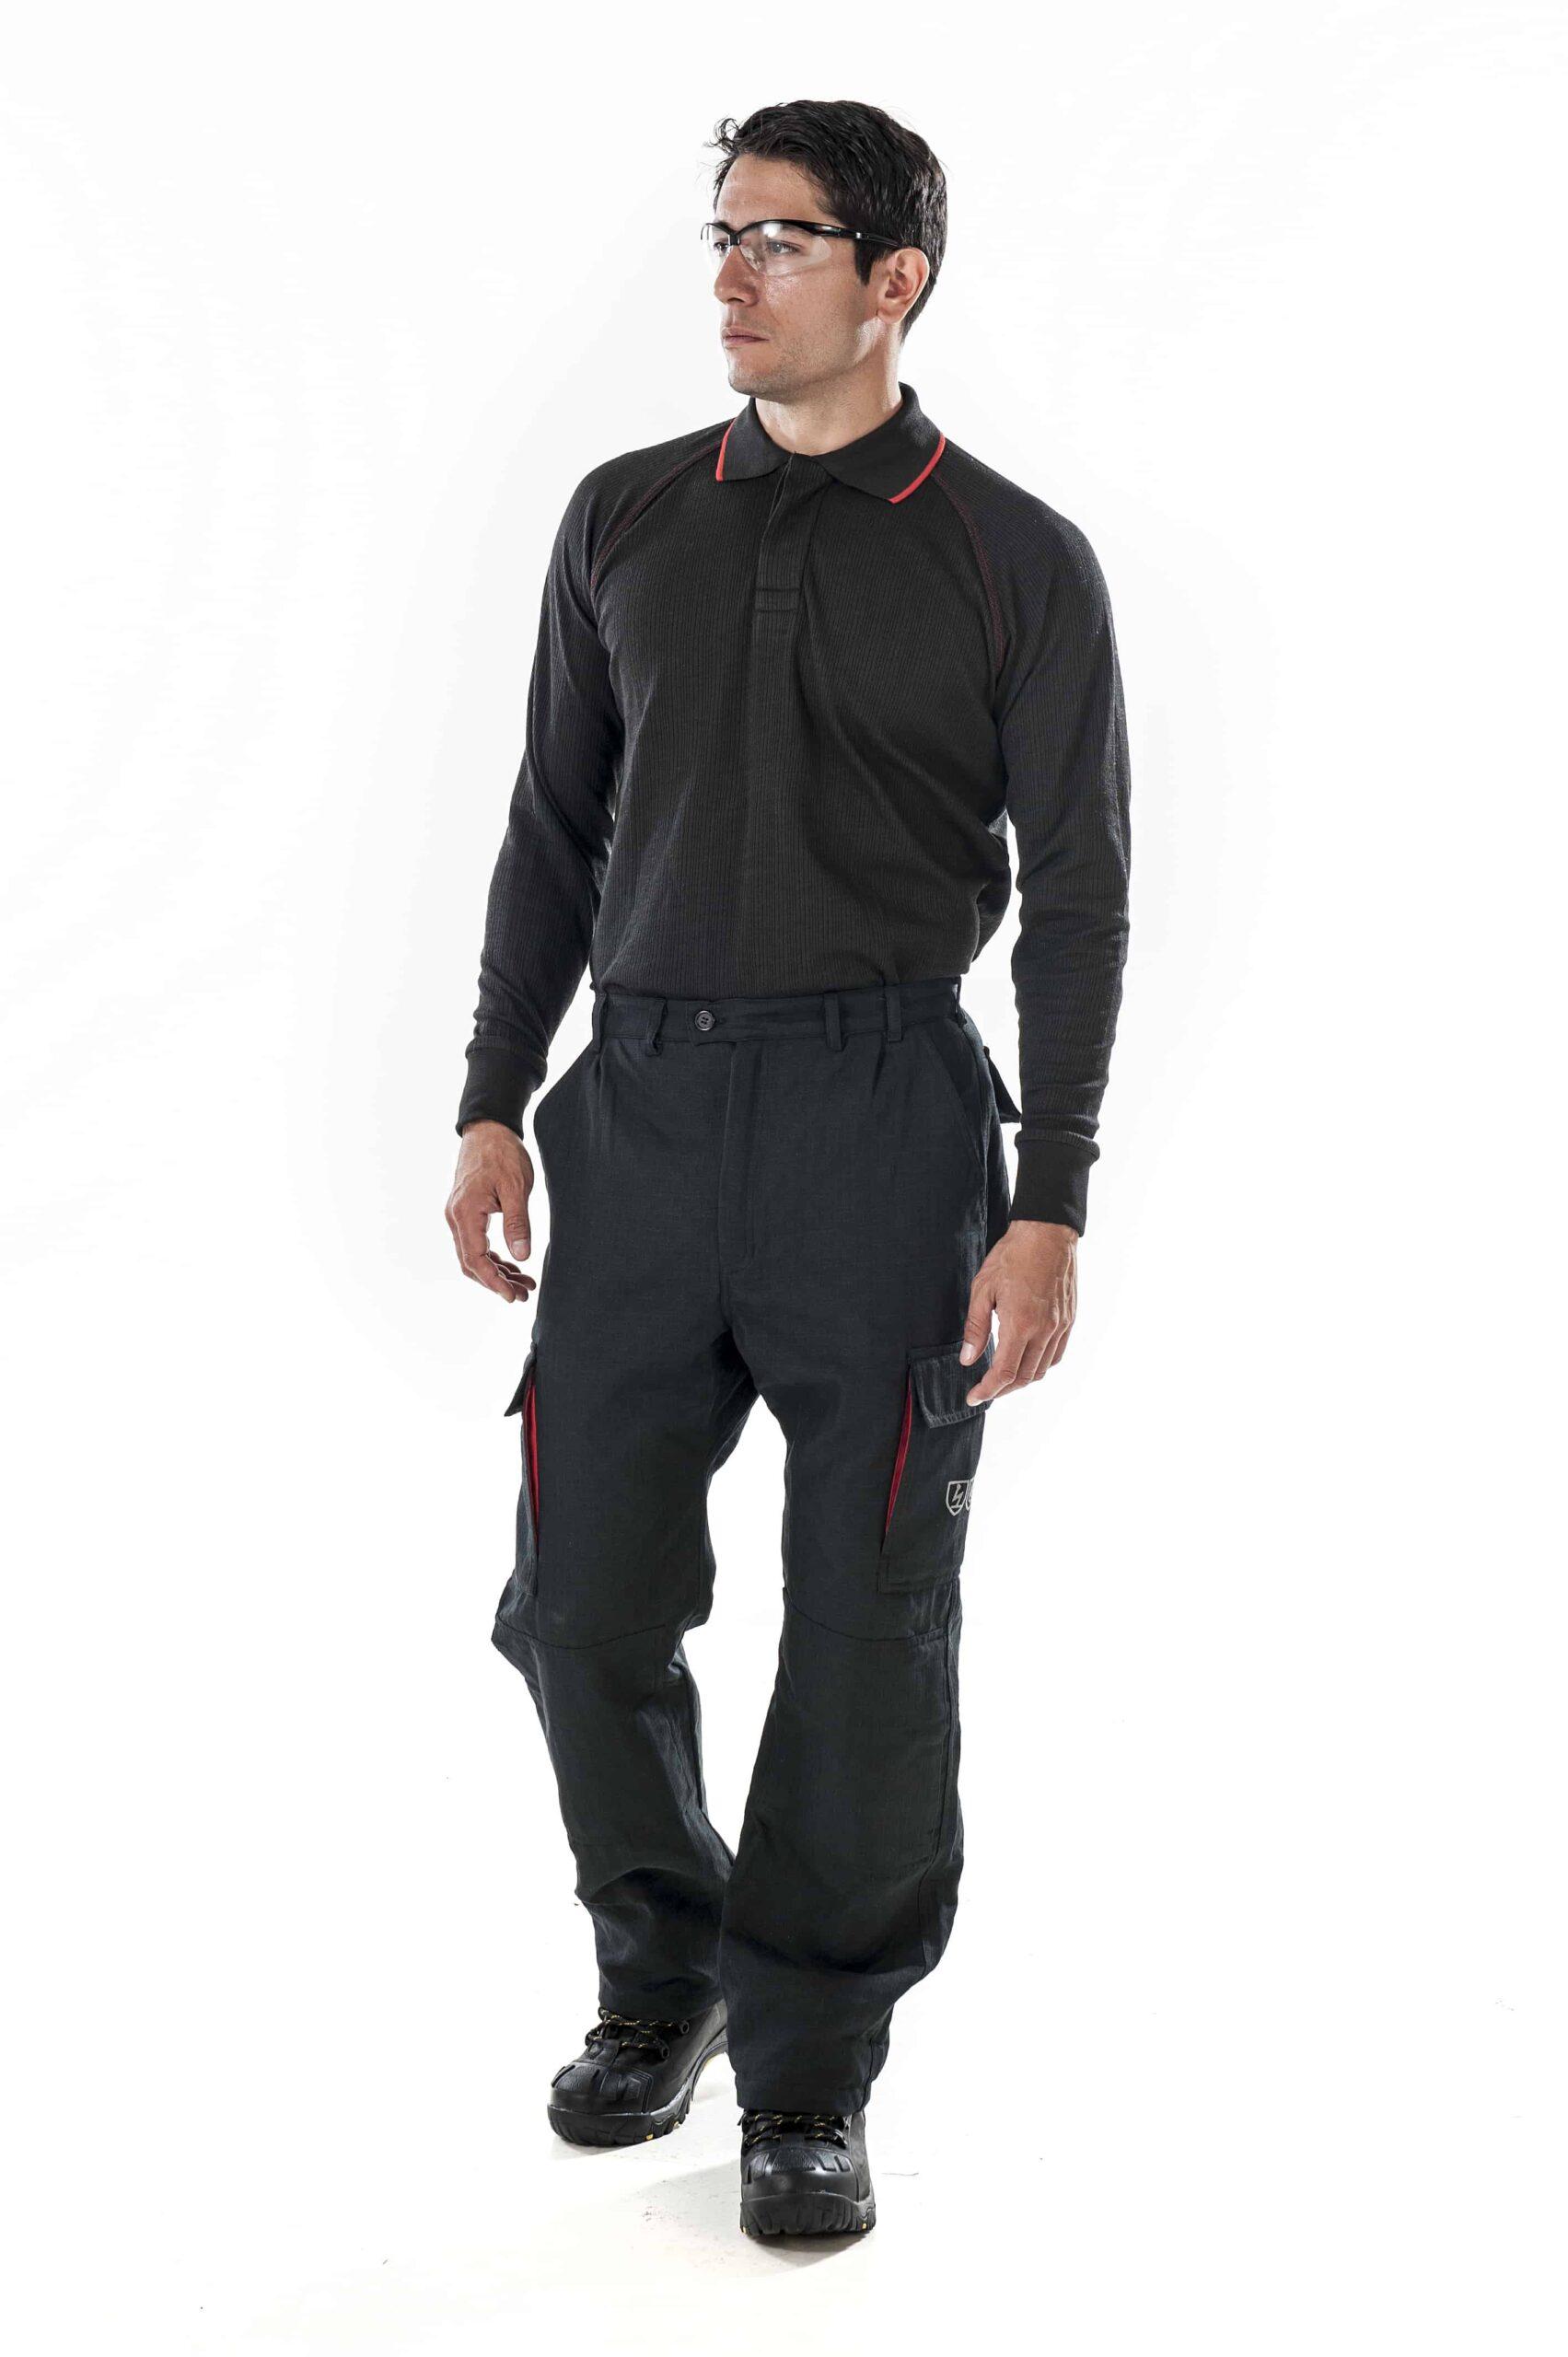 ARCBAN Black Long Sleeved NOMEX POLO